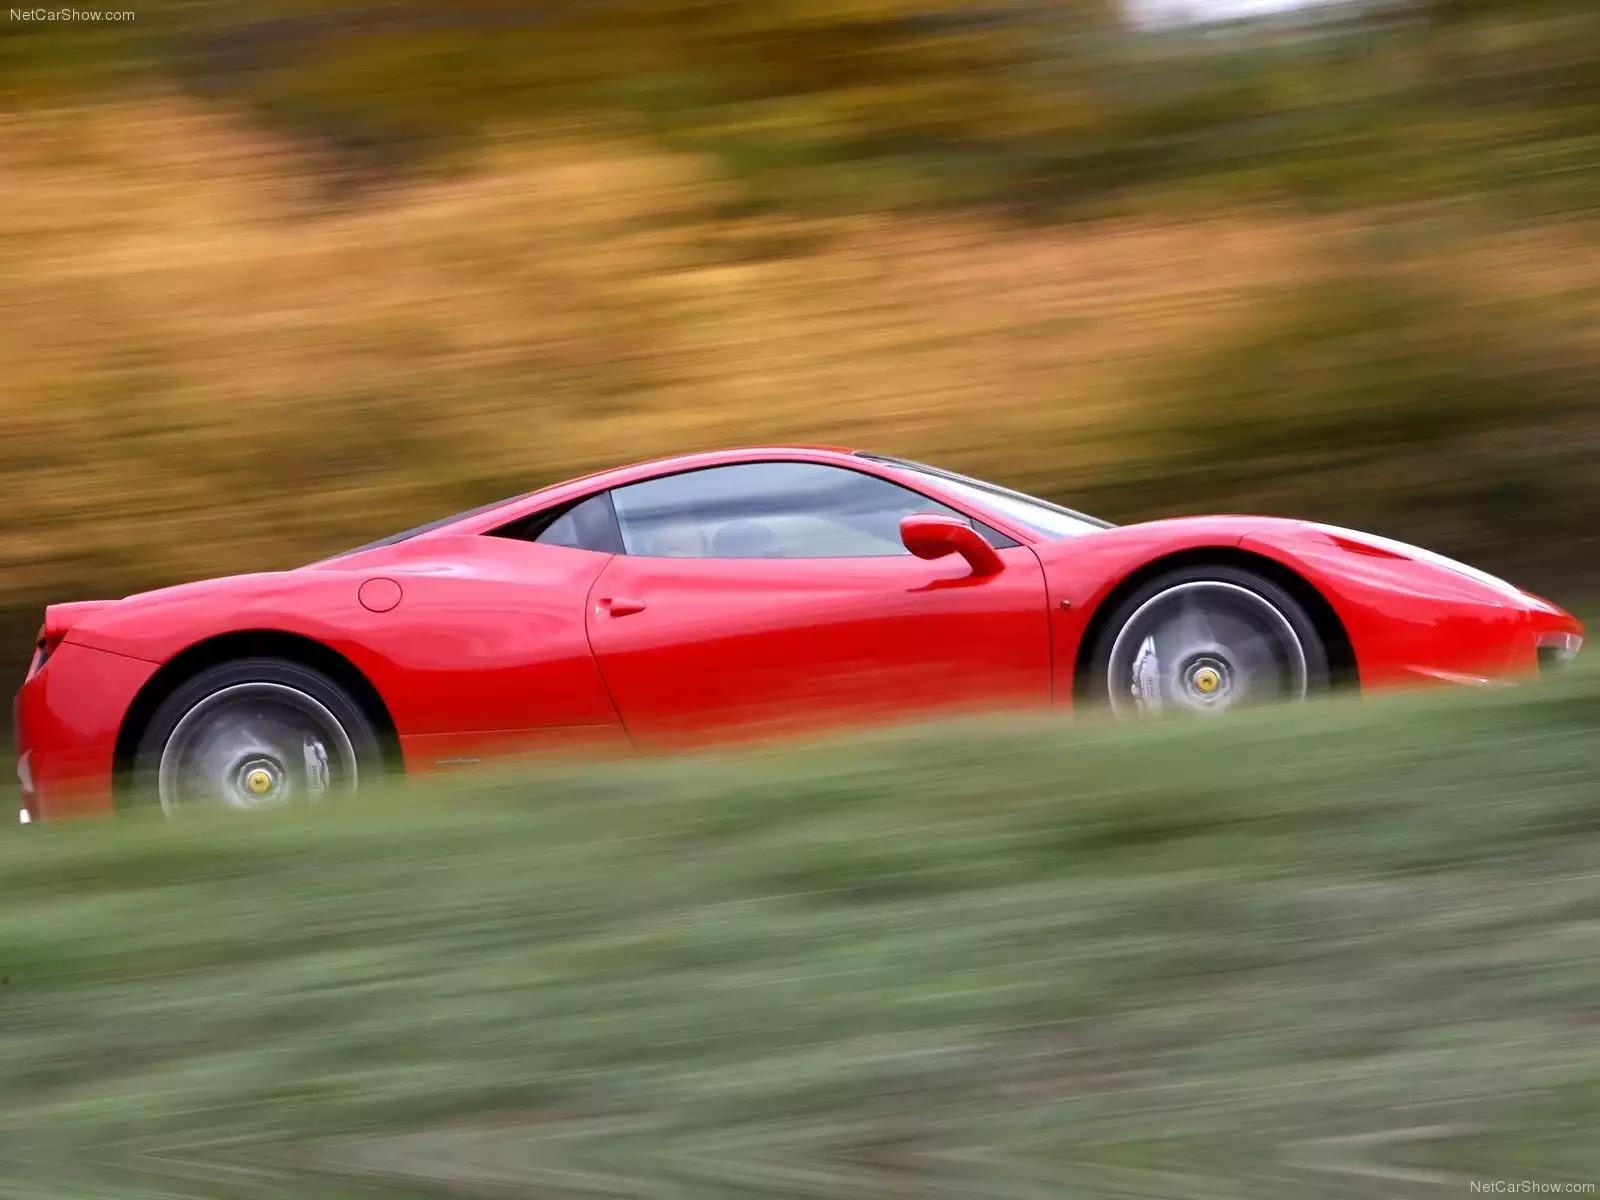 Hình ảnh siêu xe Ferrari 458 Italia 2011 & nội ngoại thất